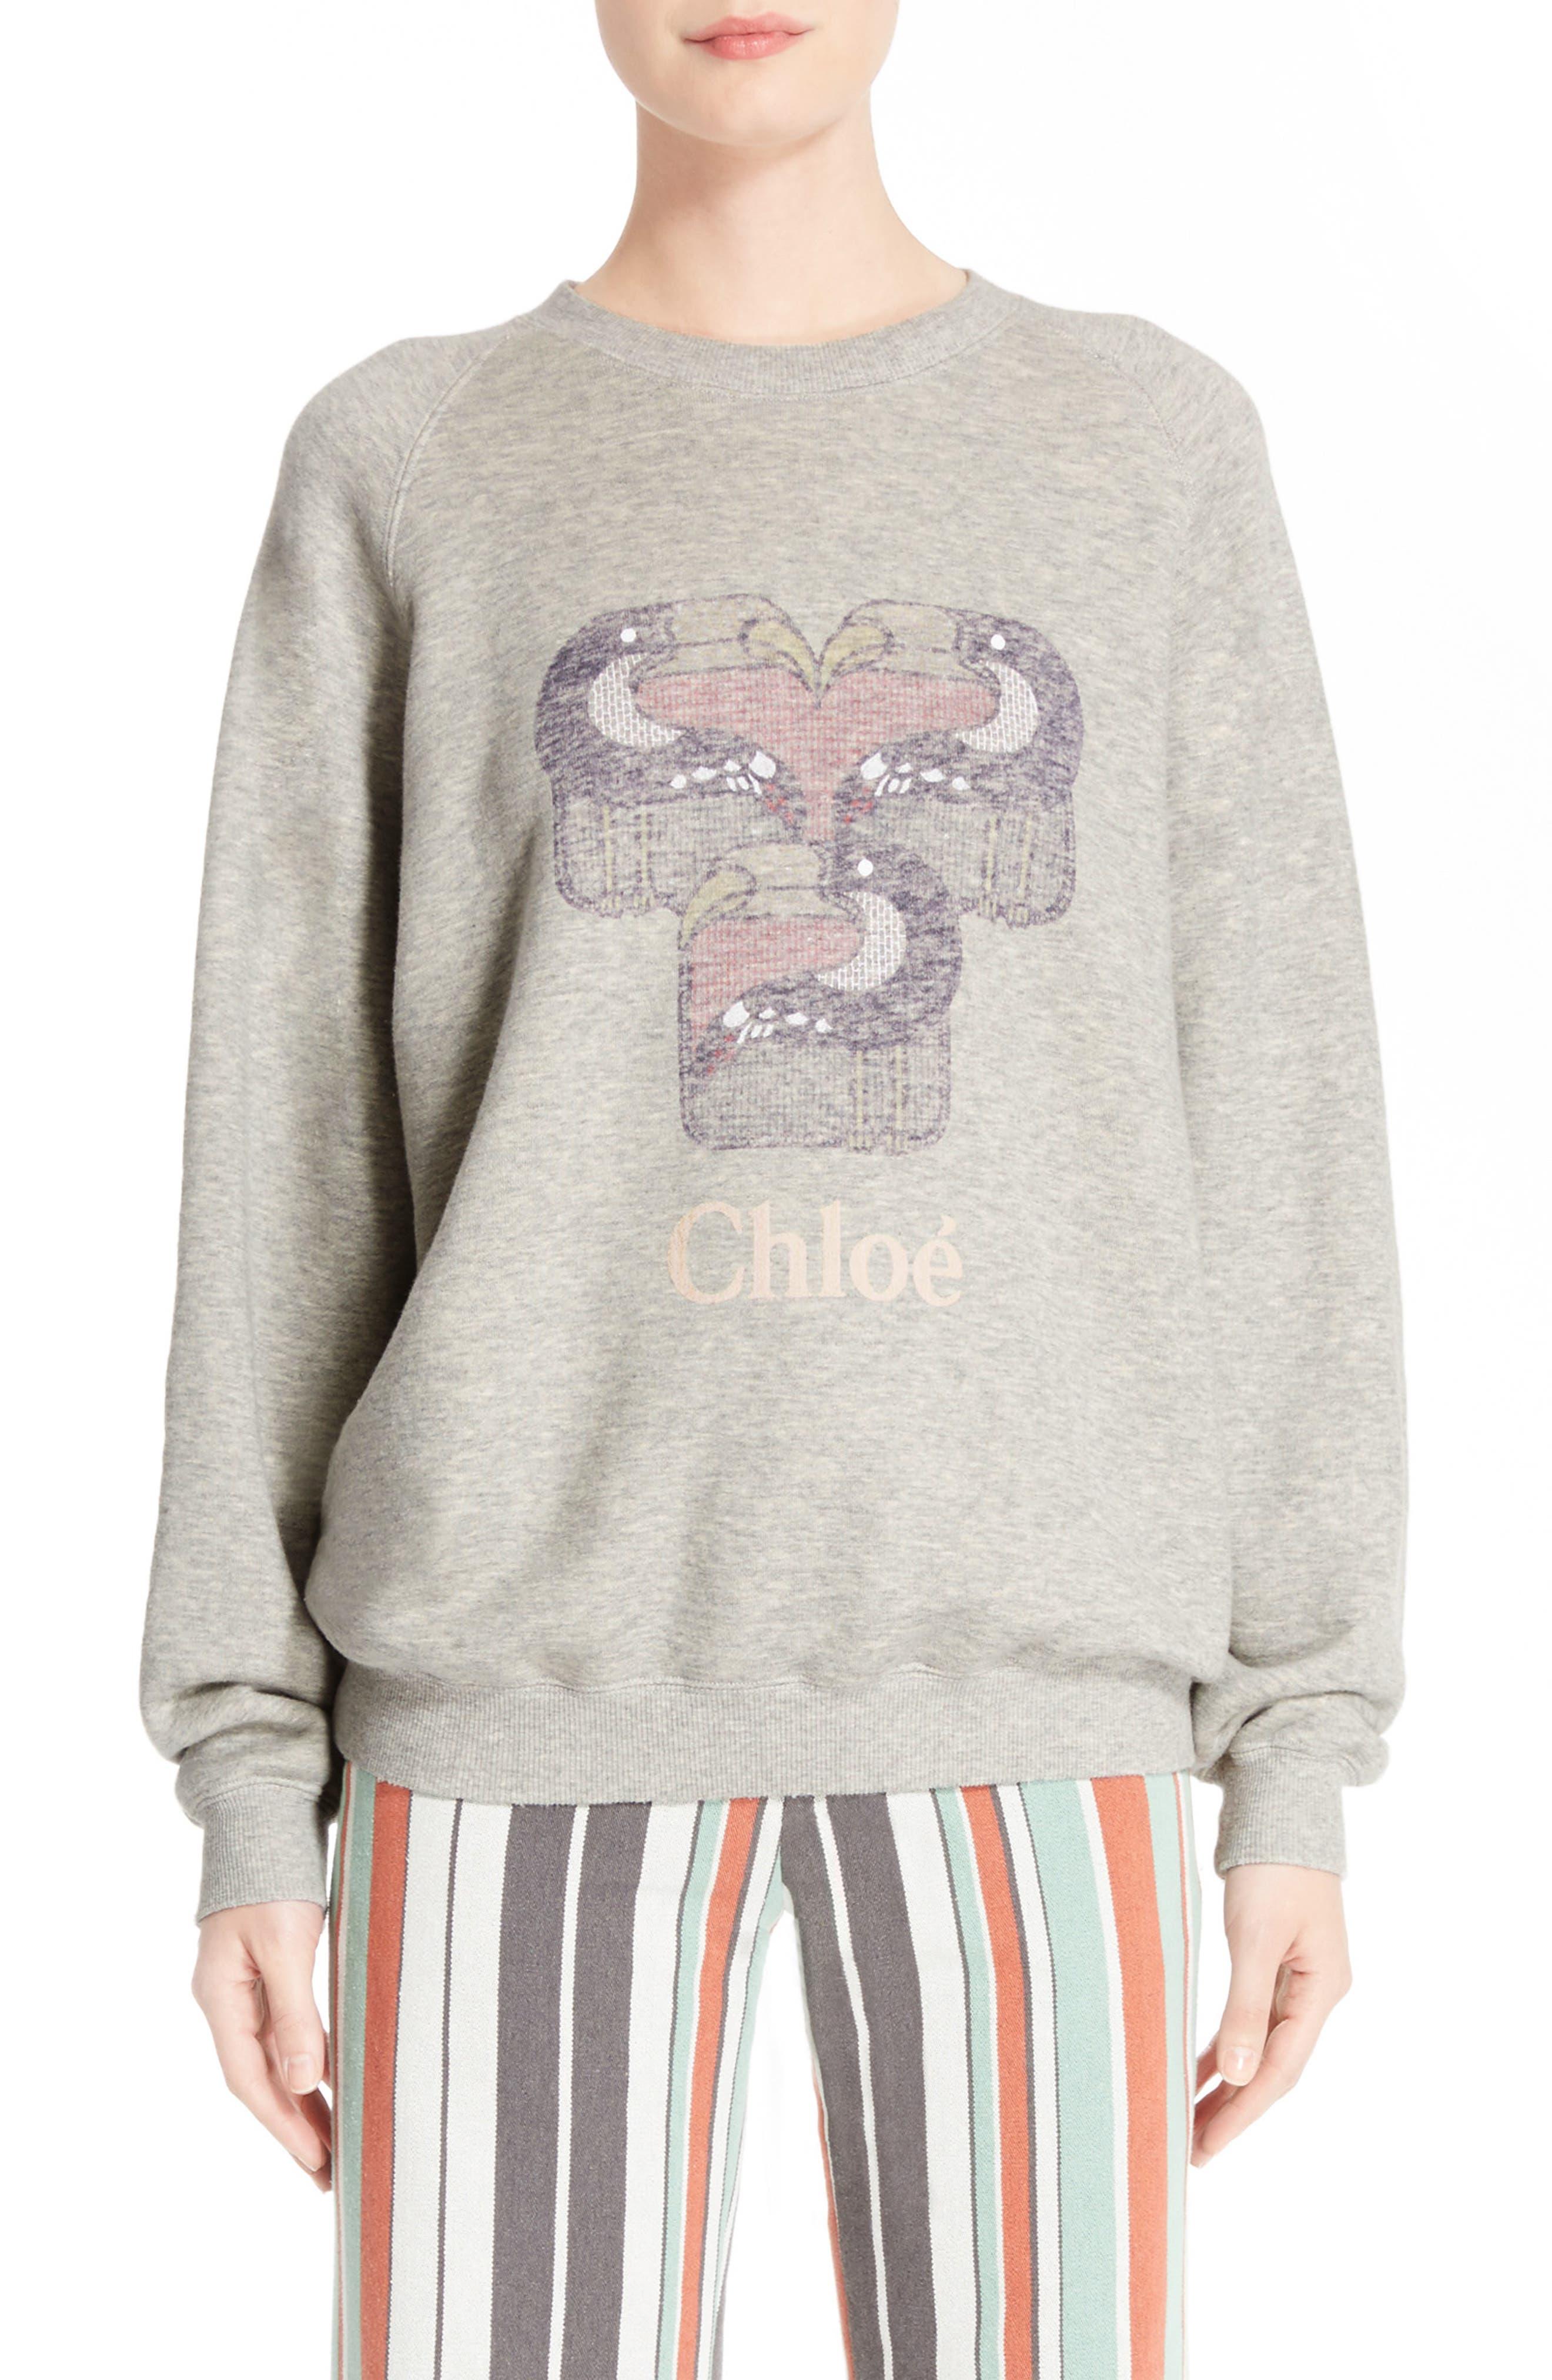 Chloé Pelican Print Sweatshirt